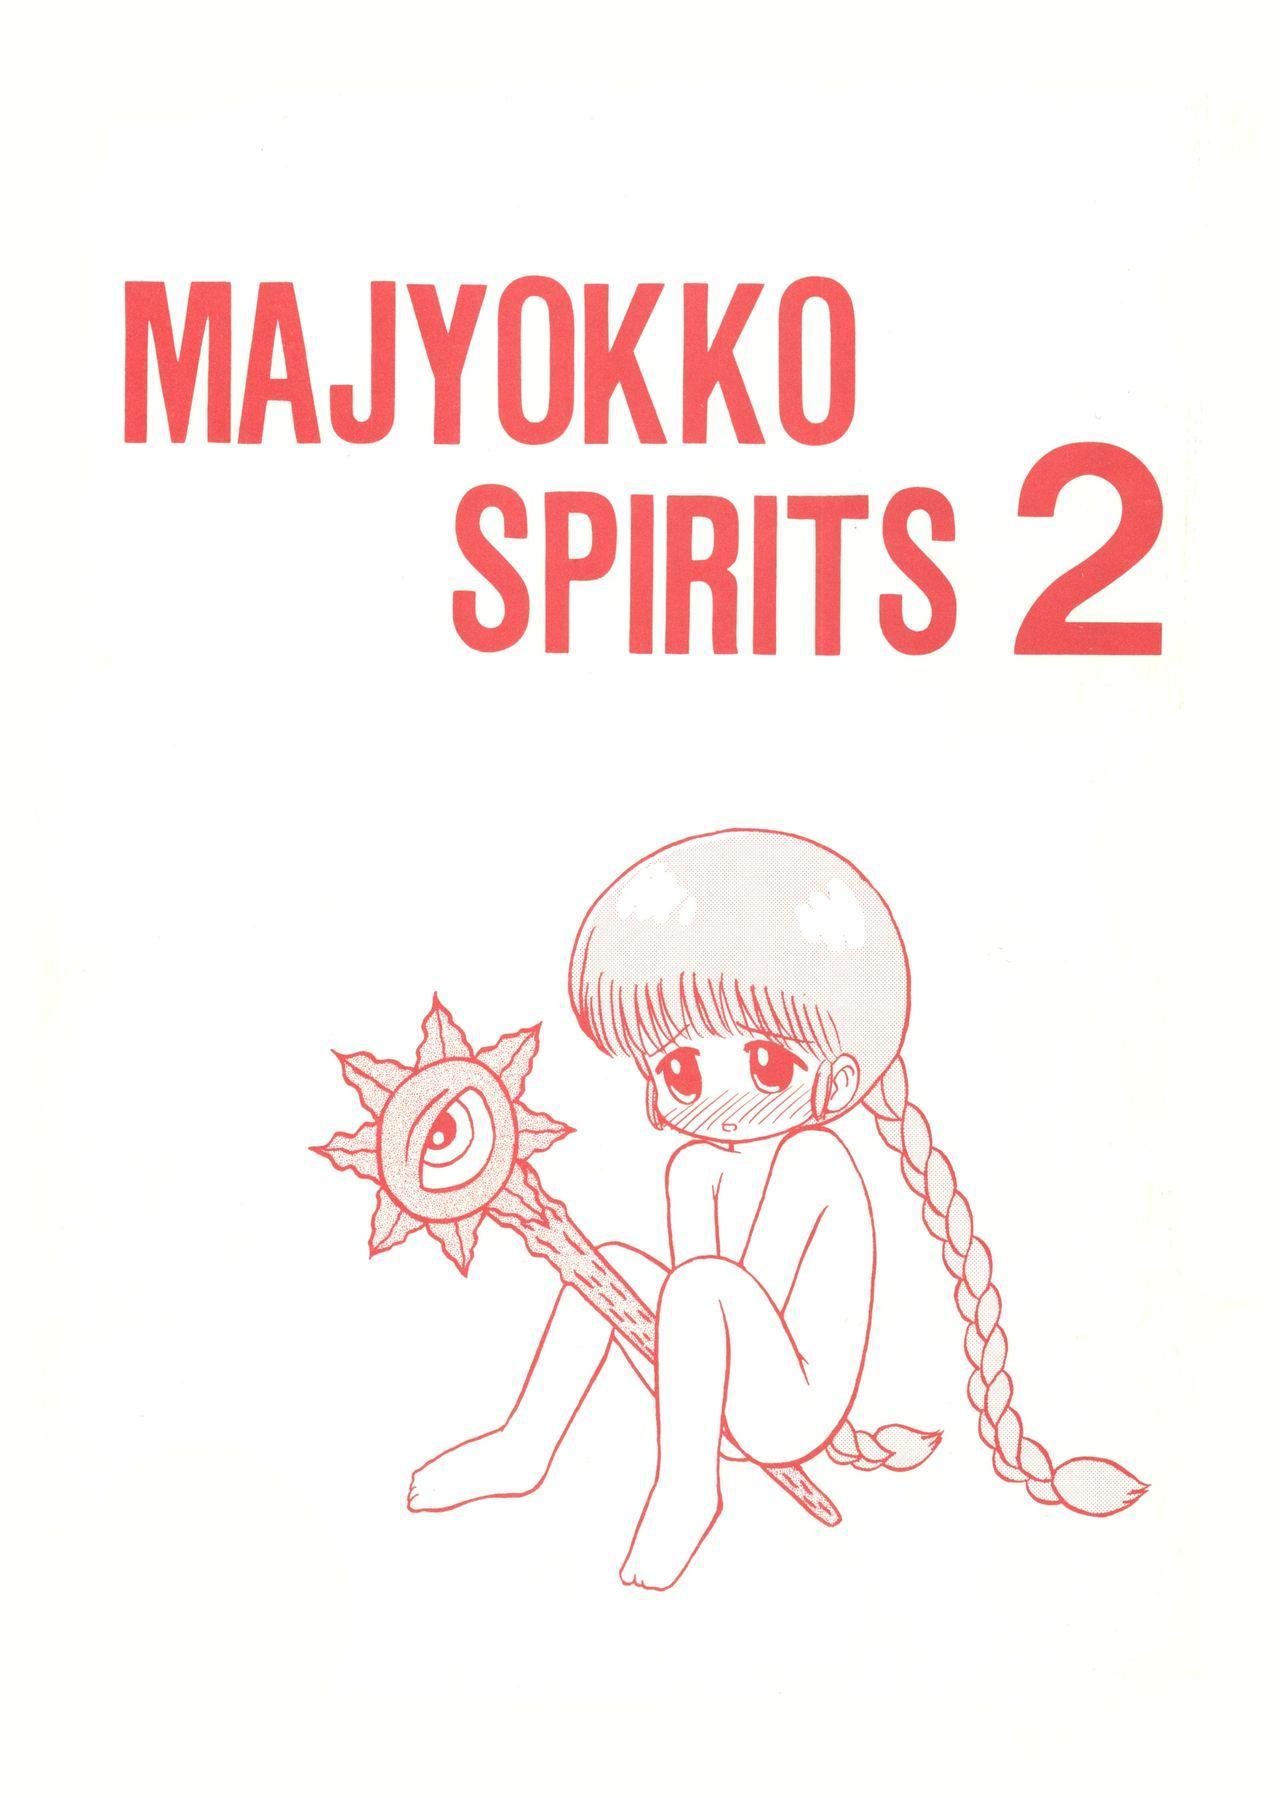 Majyokko Spirits 2 47